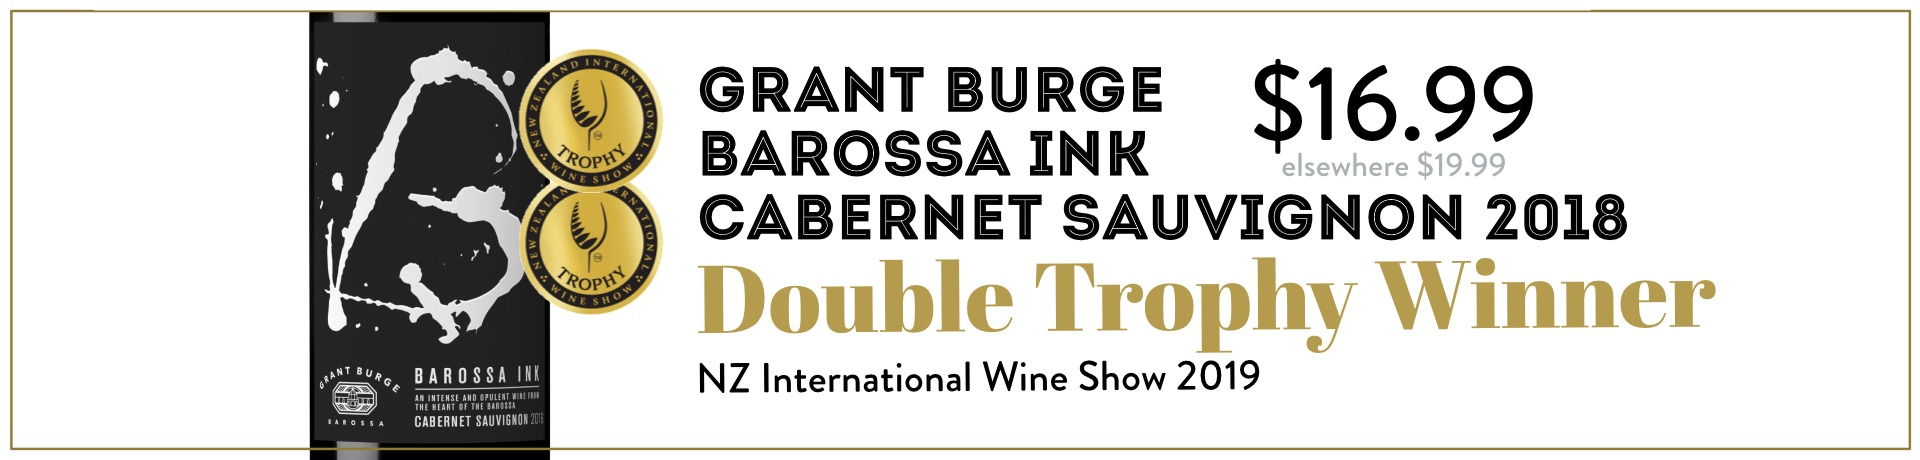 Grant Burge Barossa Ink Cabernet Sauvignon 2018